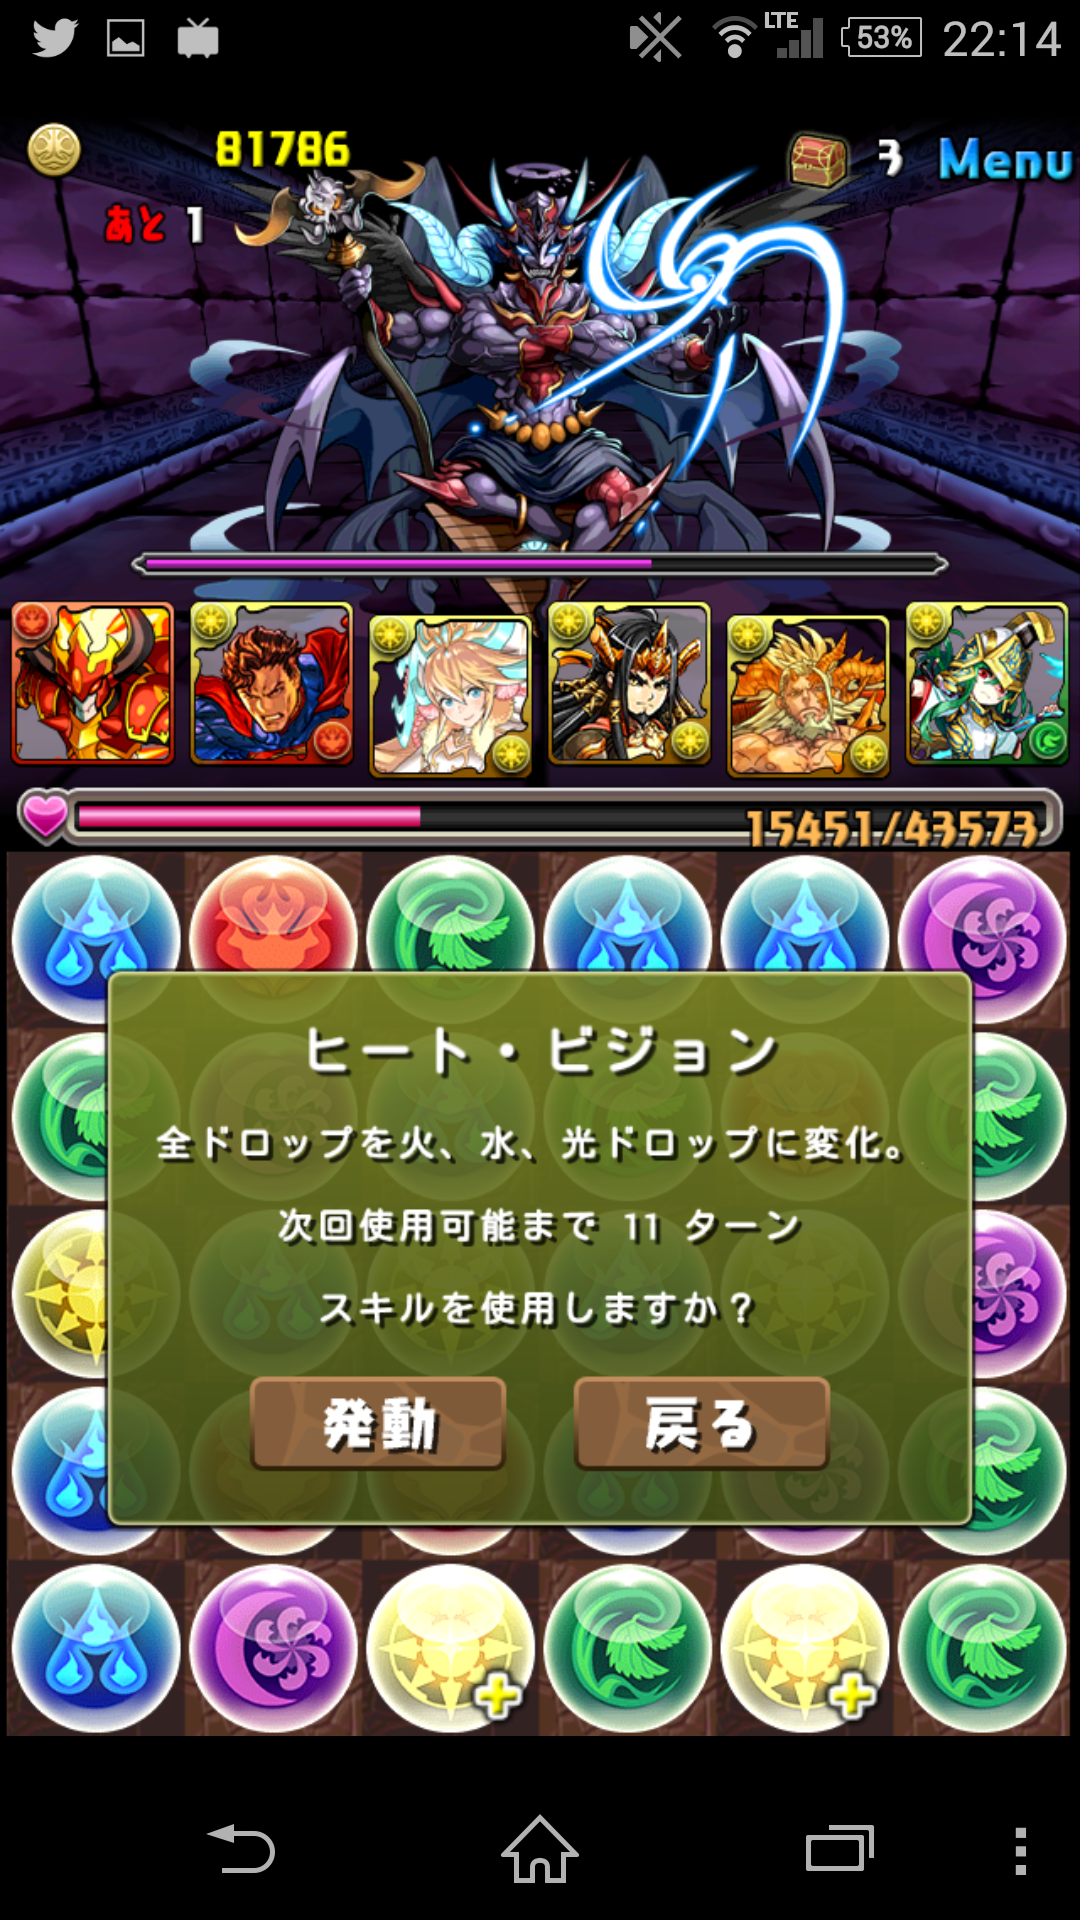 Screenshot_2015-01-24-22-14-53.png